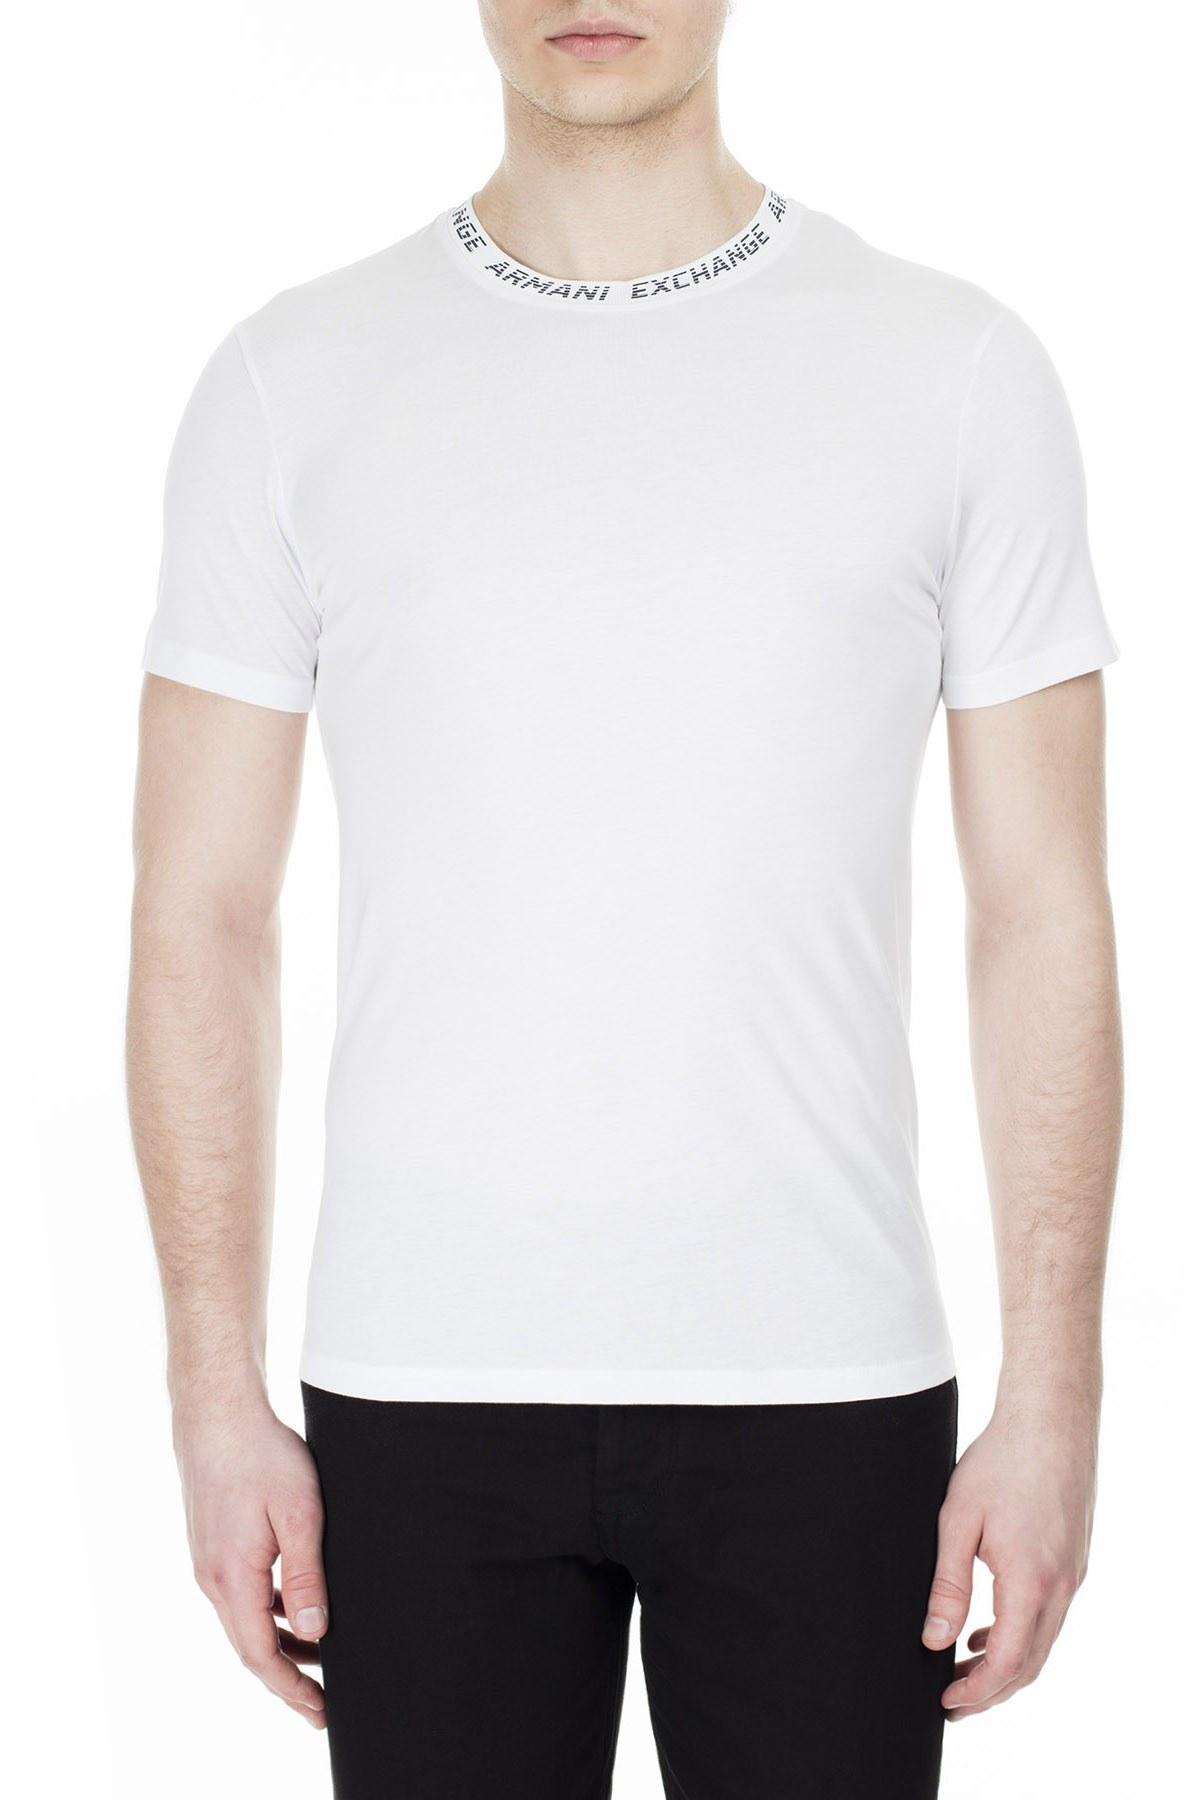 Armani Exchange Erkek T Shirt 3HZTFL ZJA5Z 1100 BEYAZ